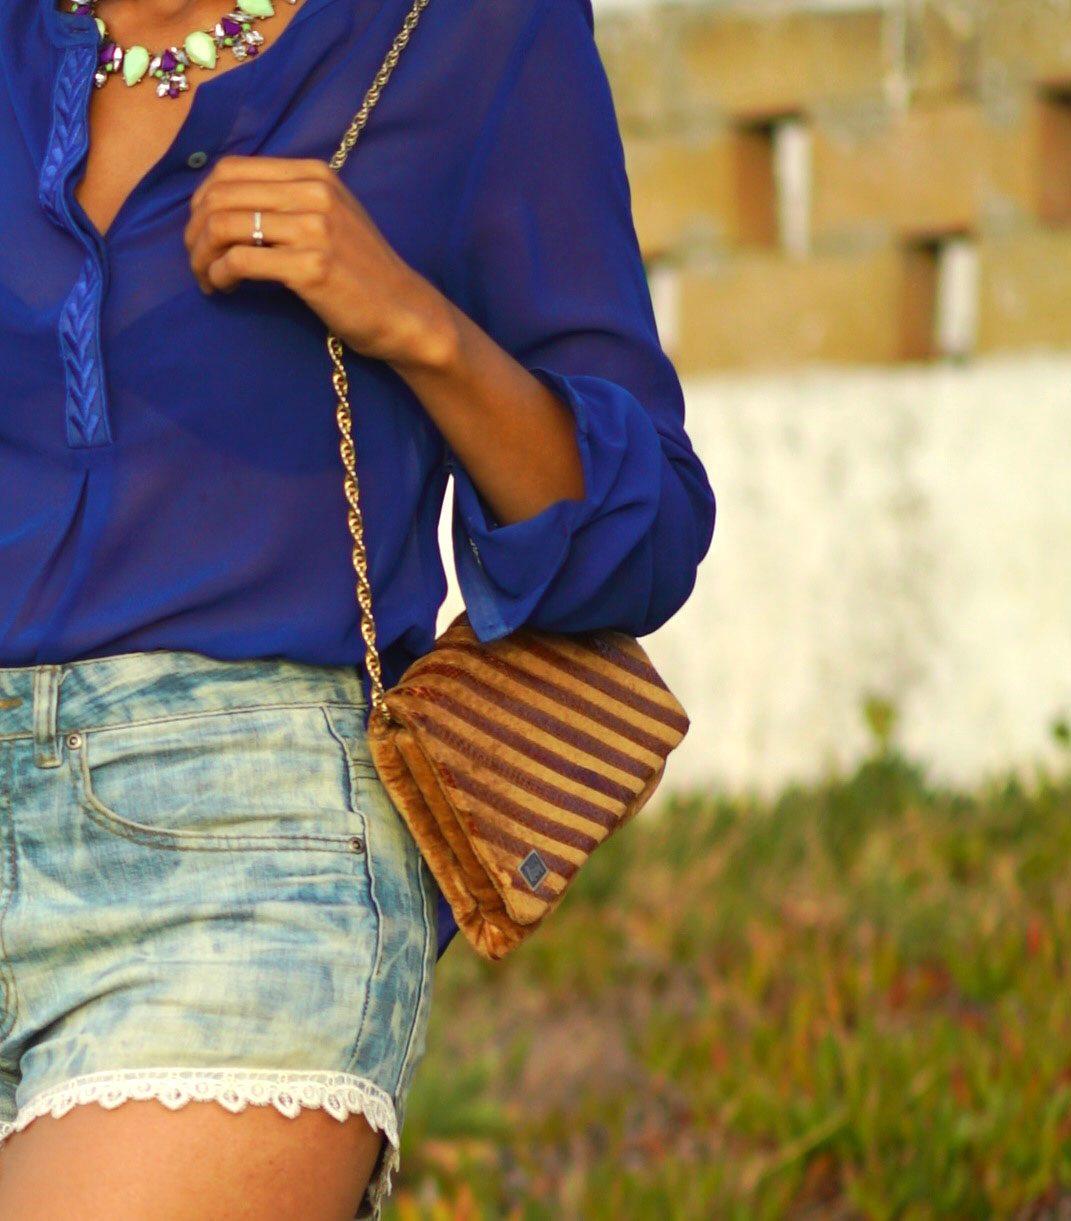 Summer series: Denim & lace shorts